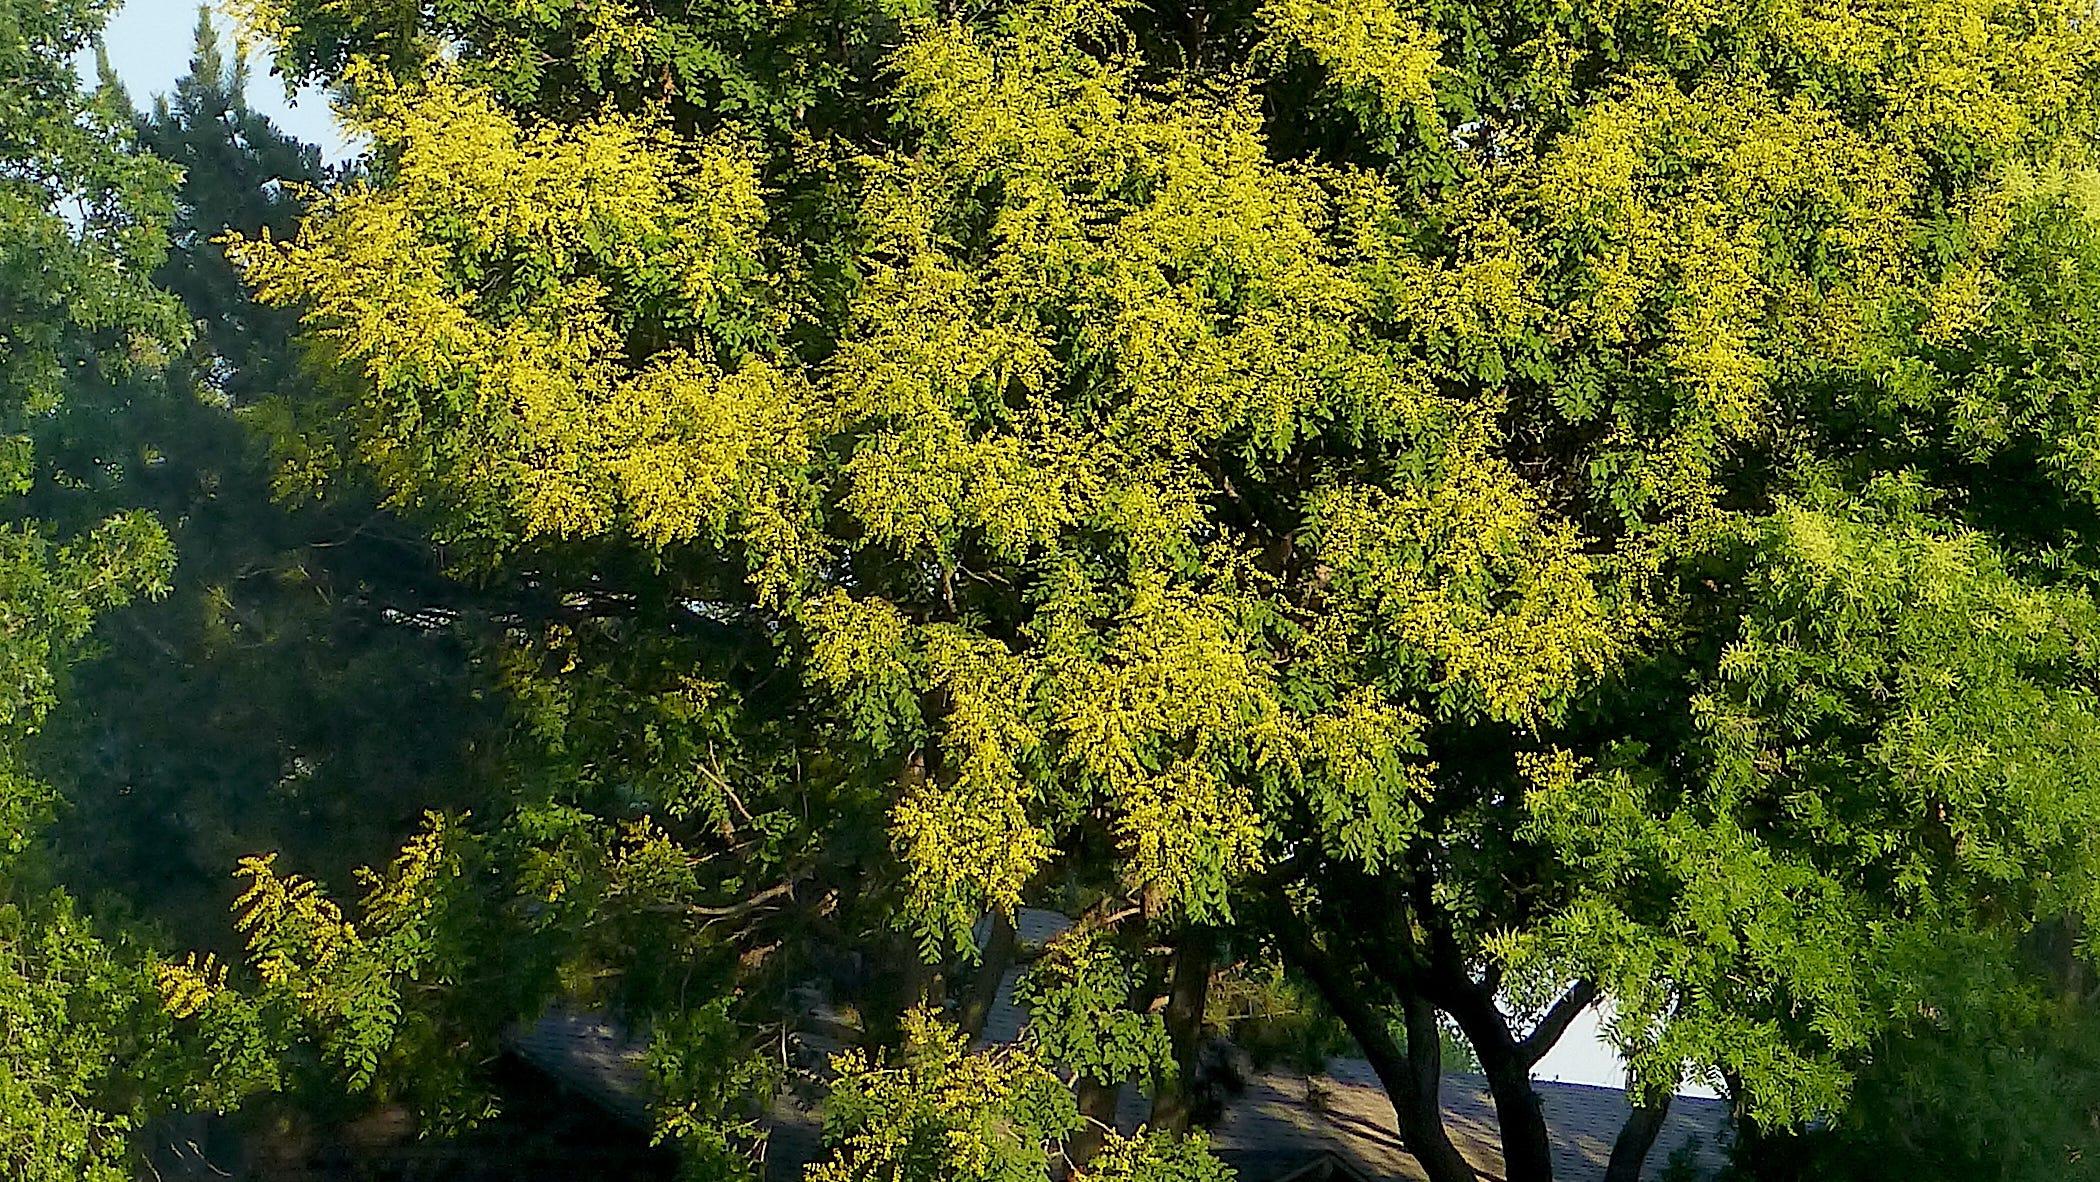 Peffley: Golden Raintree a striking choice for season-long color